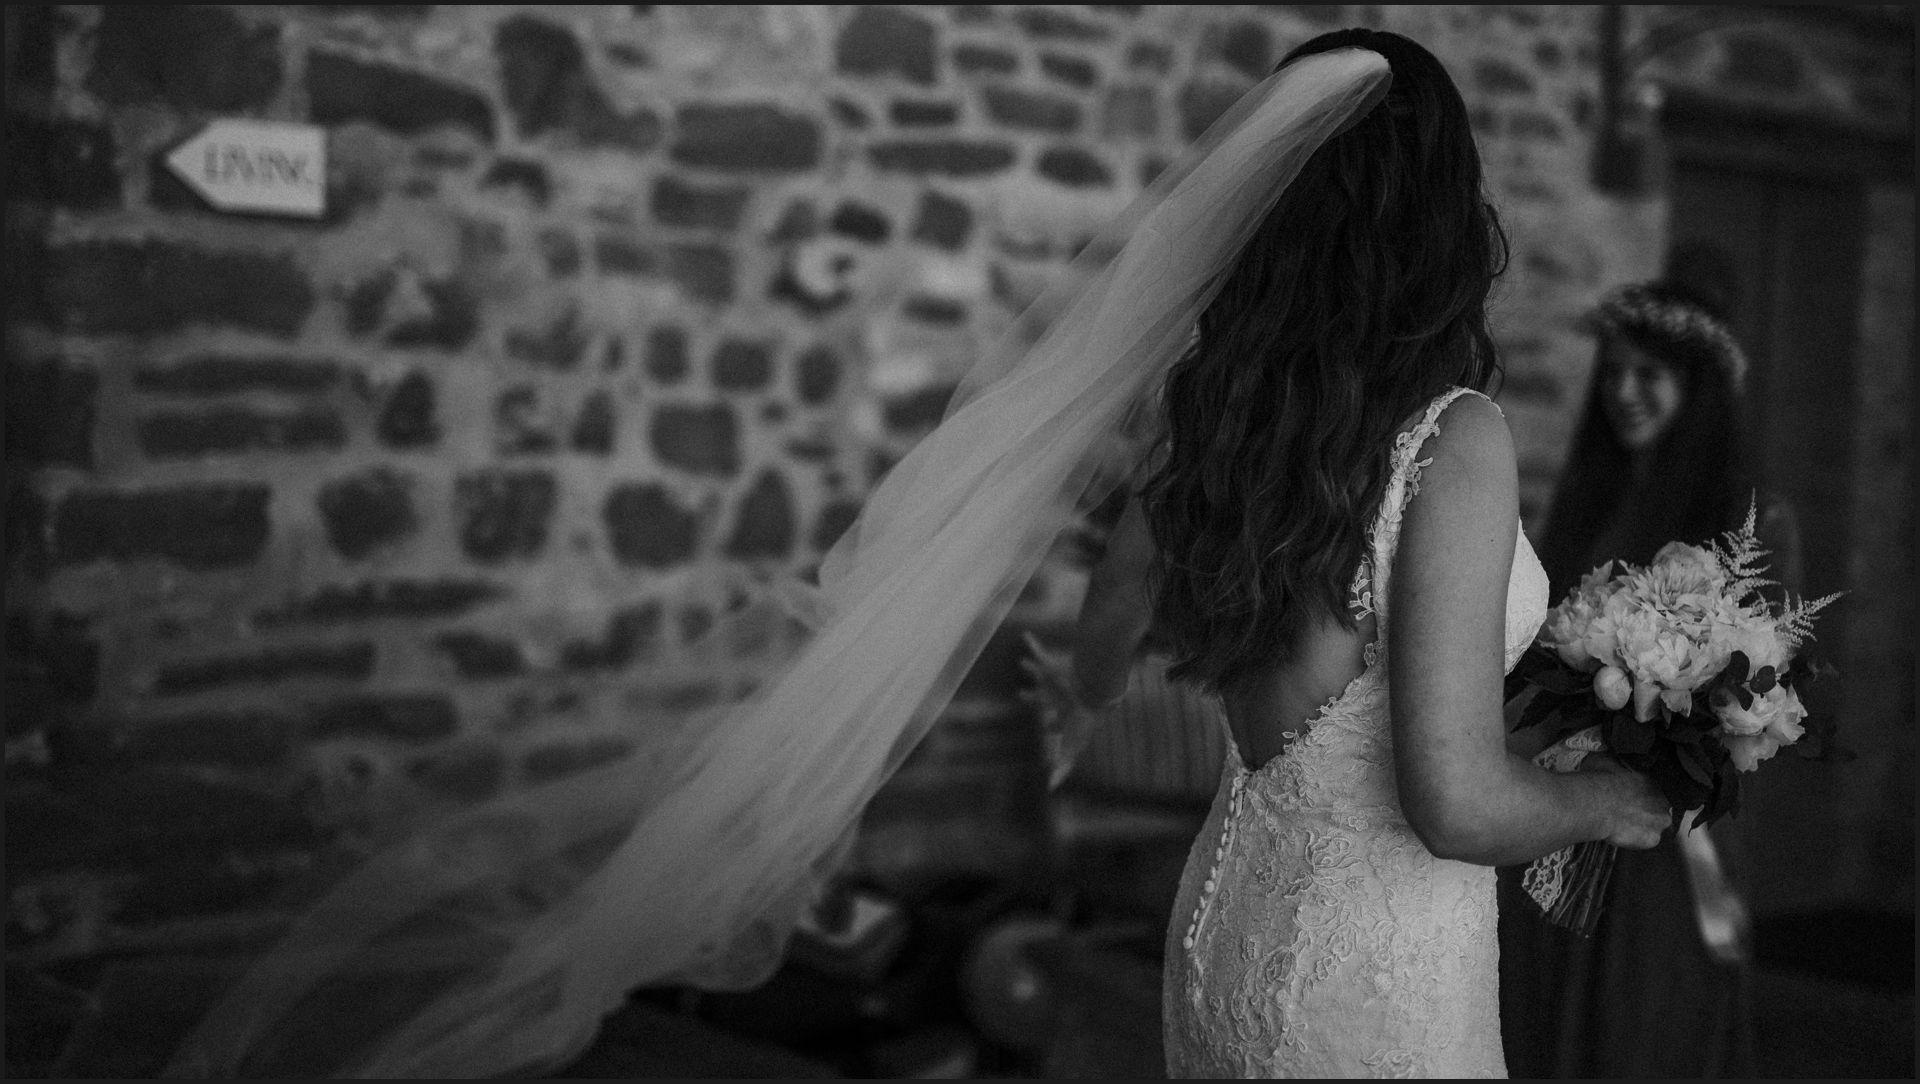 black and white, portrait, wind, hair, wedding, bride, umbria, nikis resort , veil